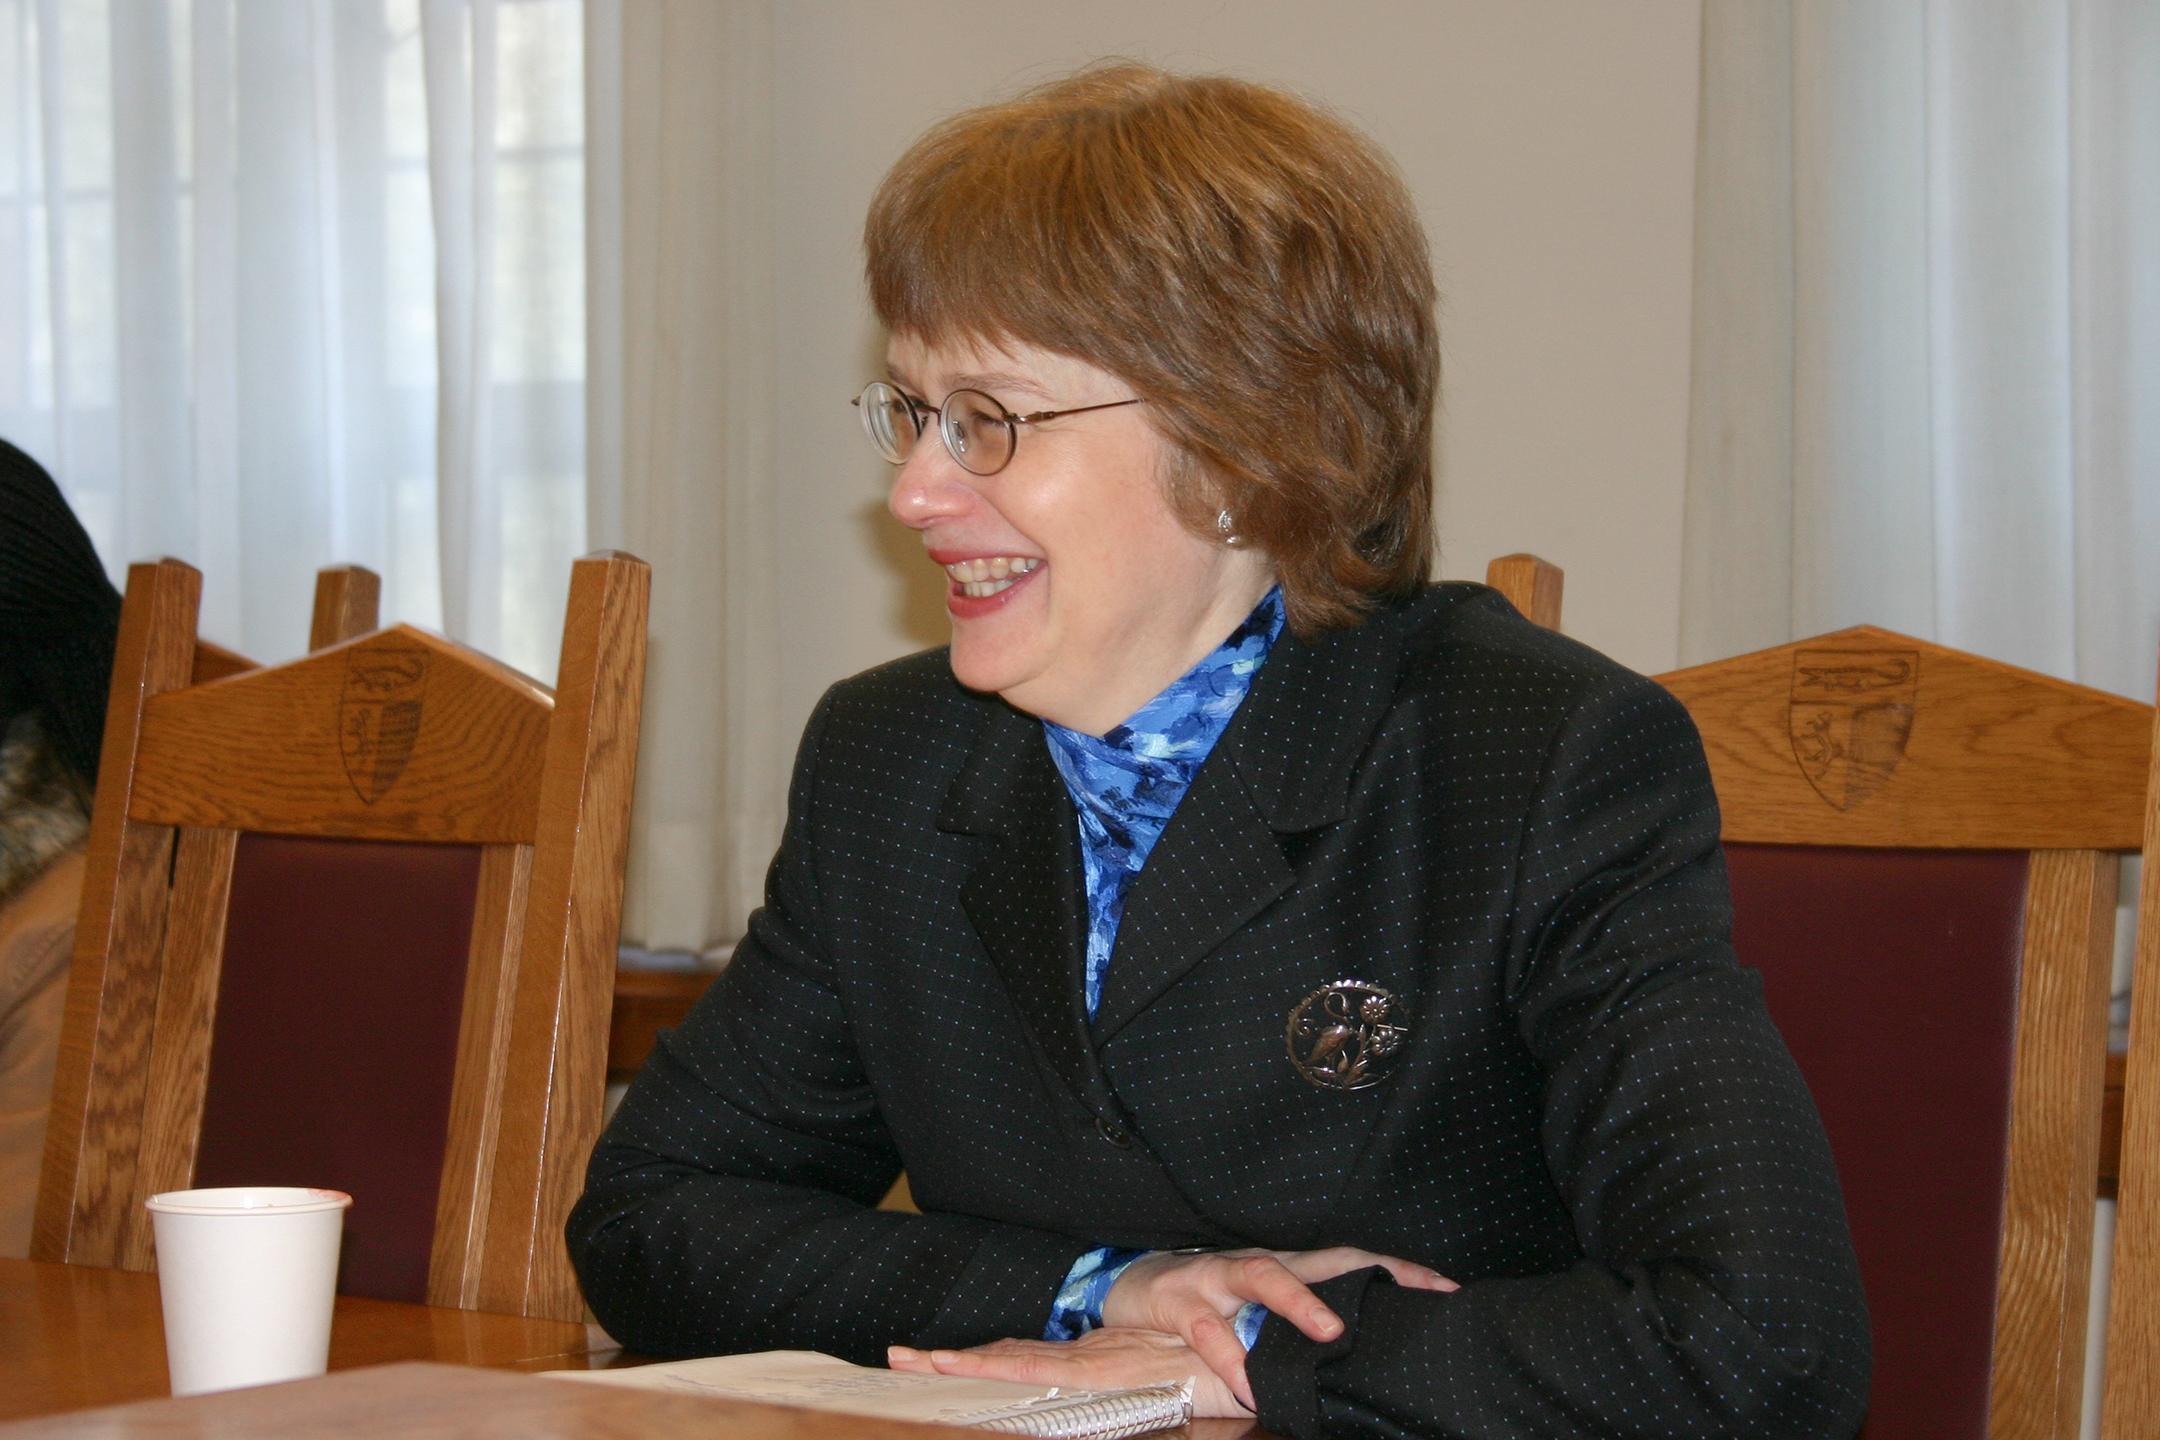 Victoria Cundiff '80